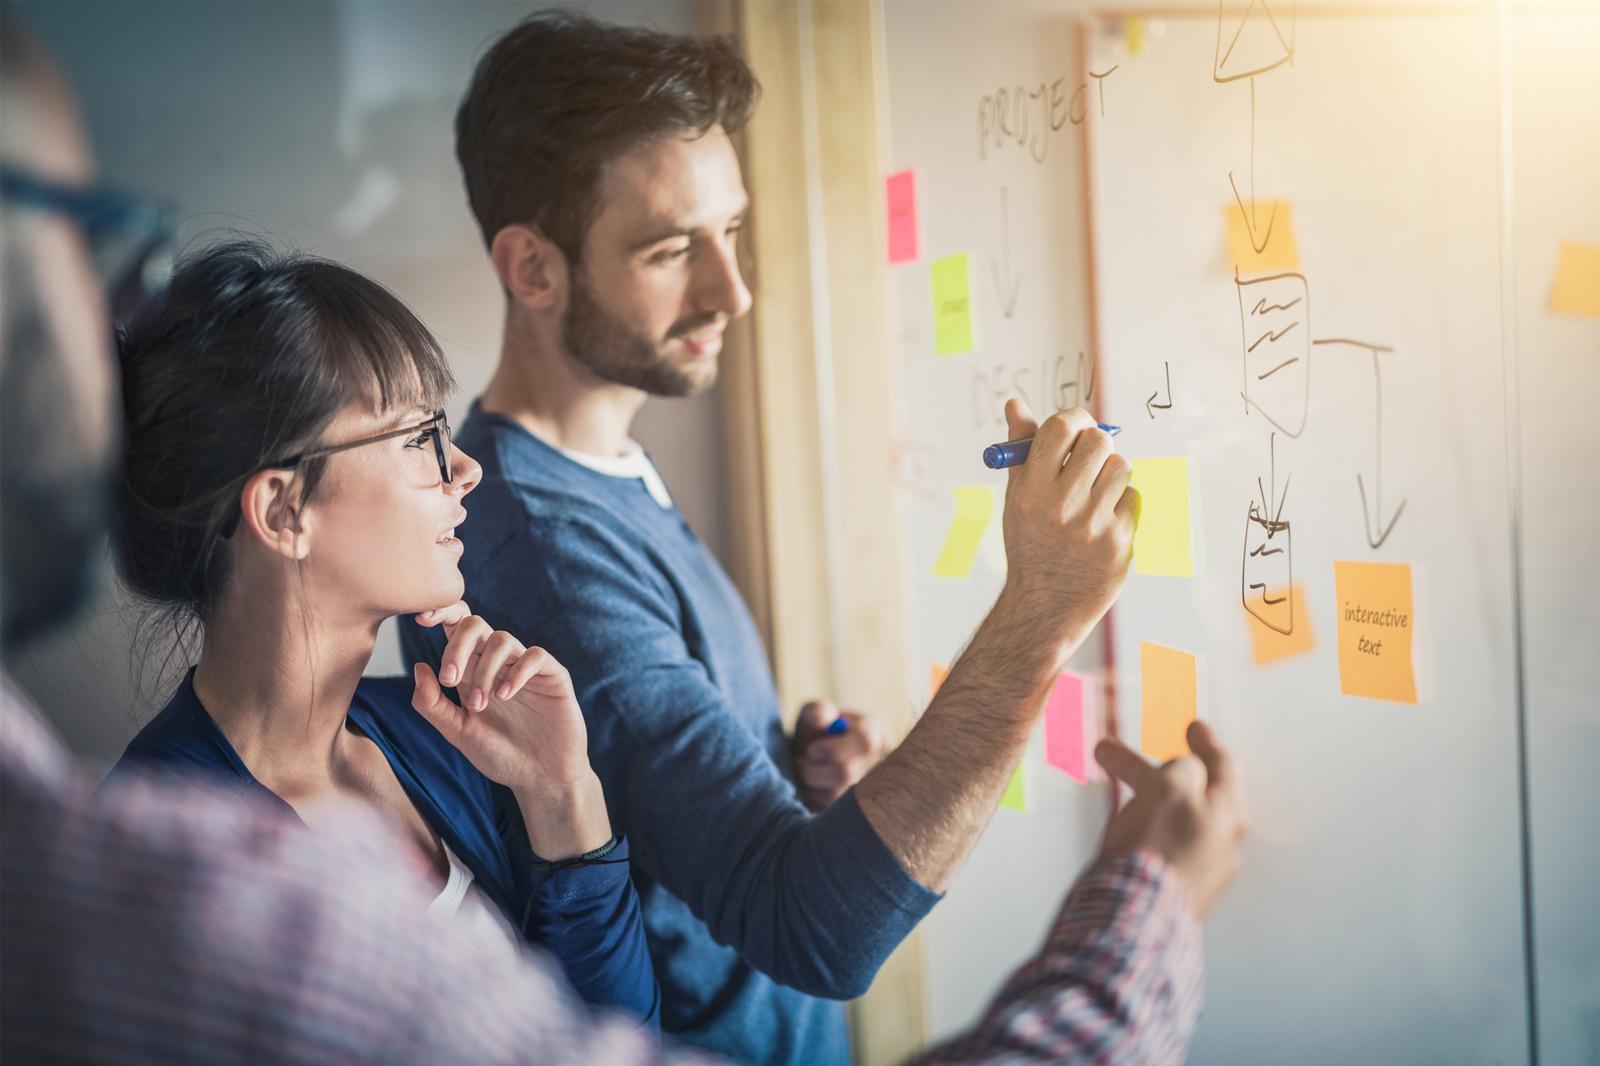 Understanding Consumer Behaviour - Targeted Marketing Course - FutureLearn